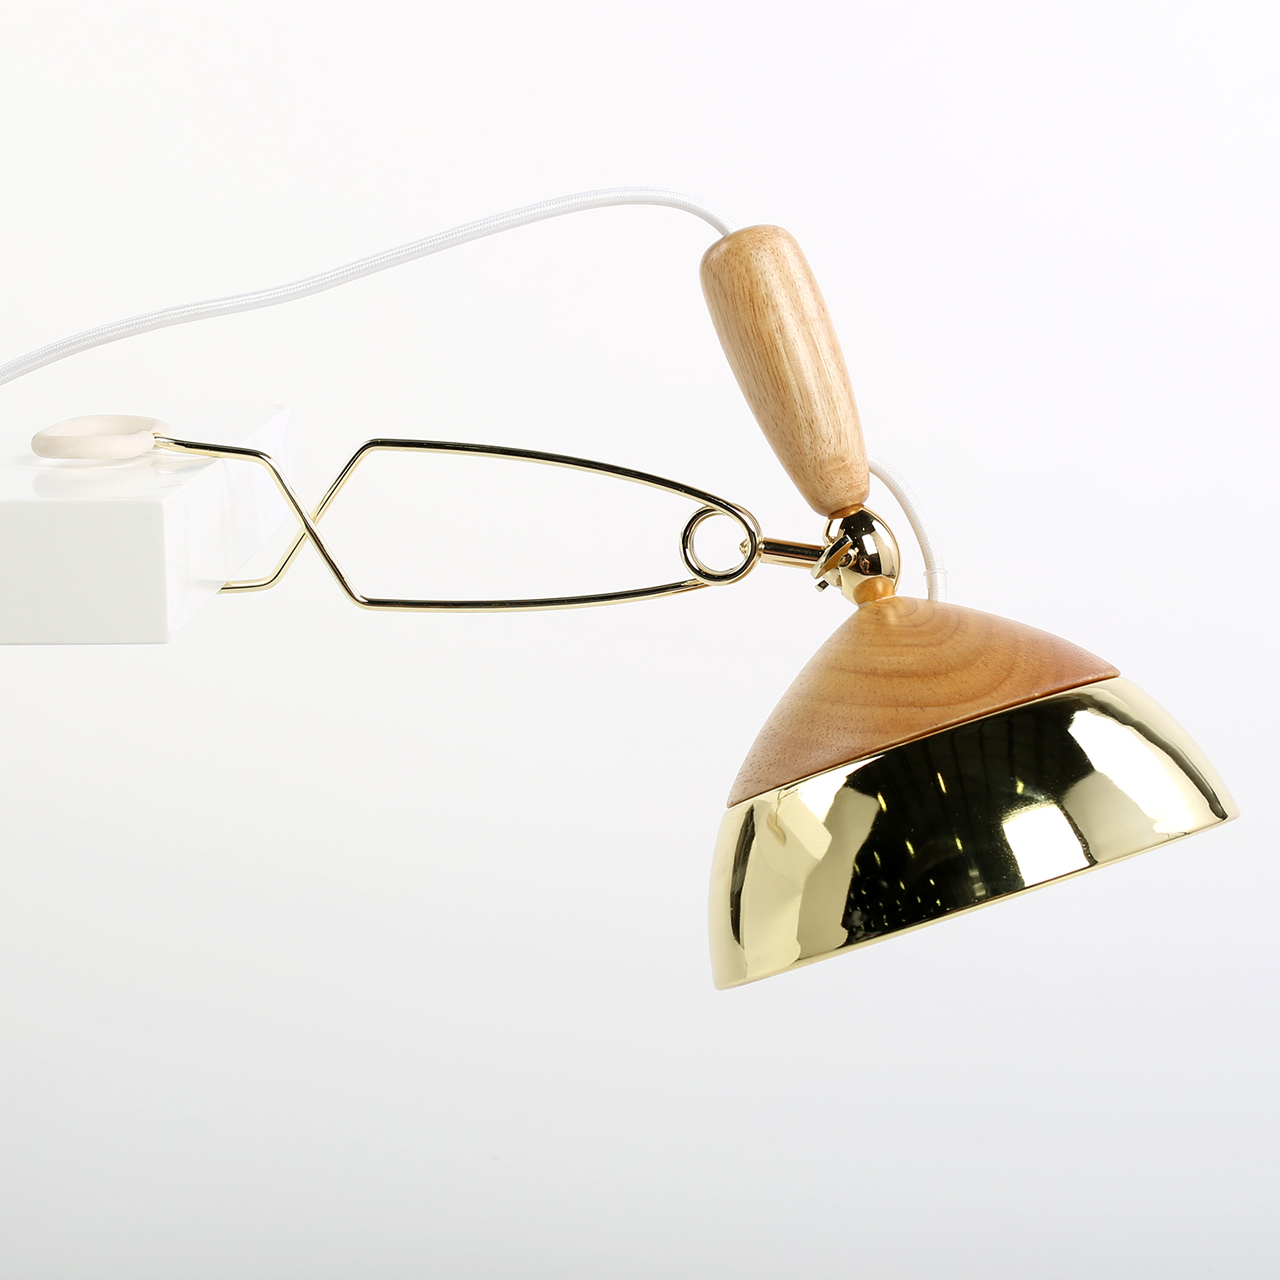 Modal Lamp by Studio McKenzie-Veal